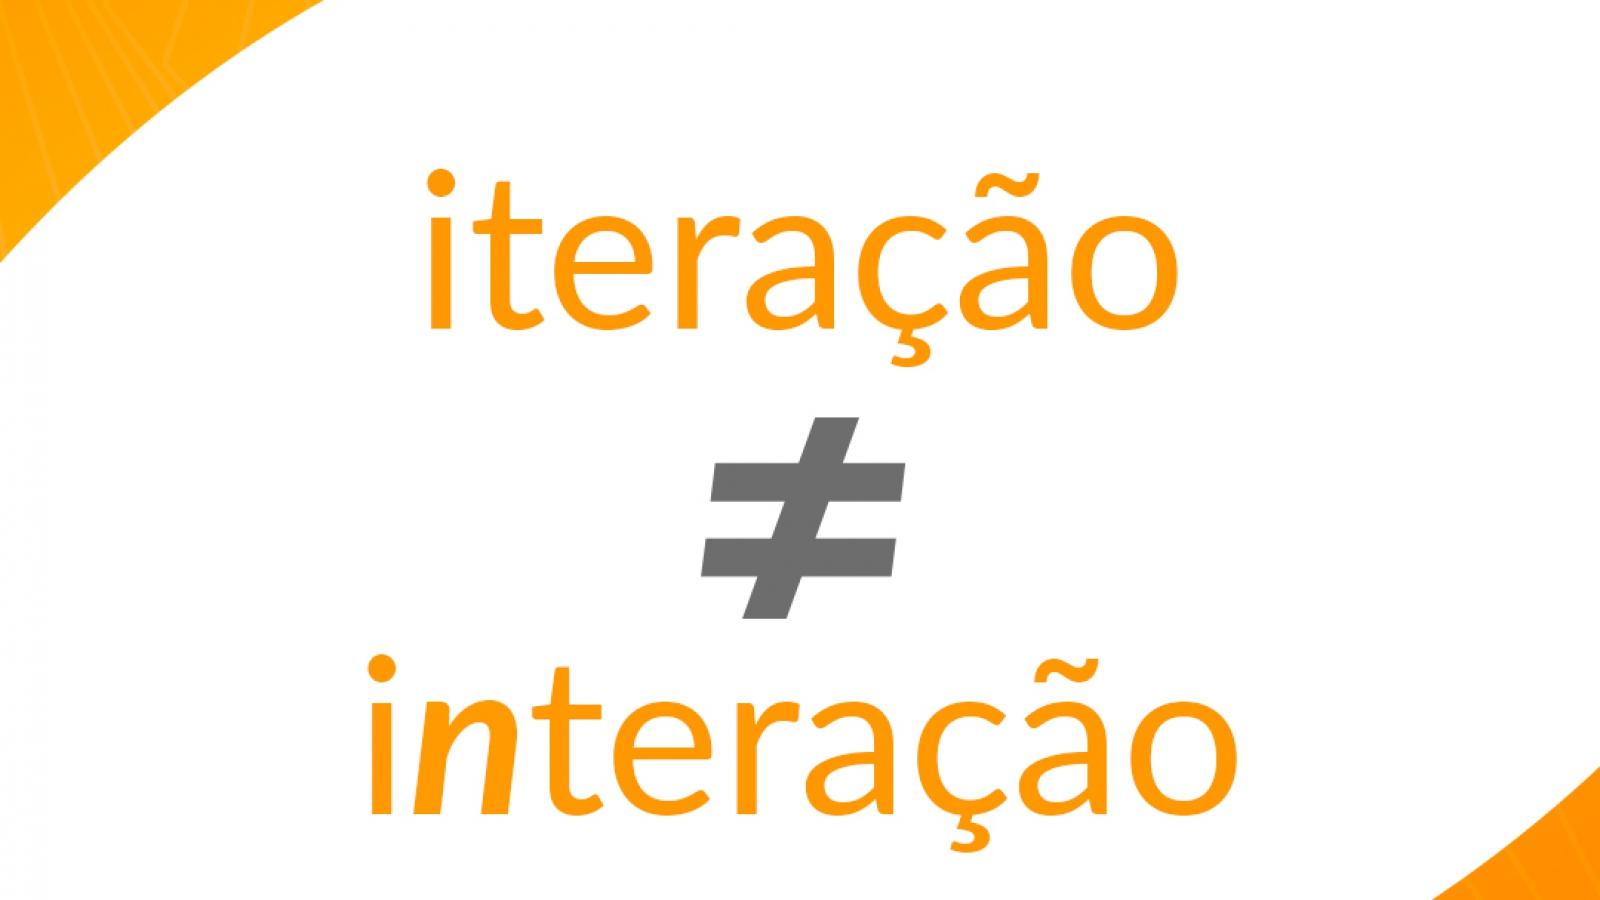 iteracao-diferenca